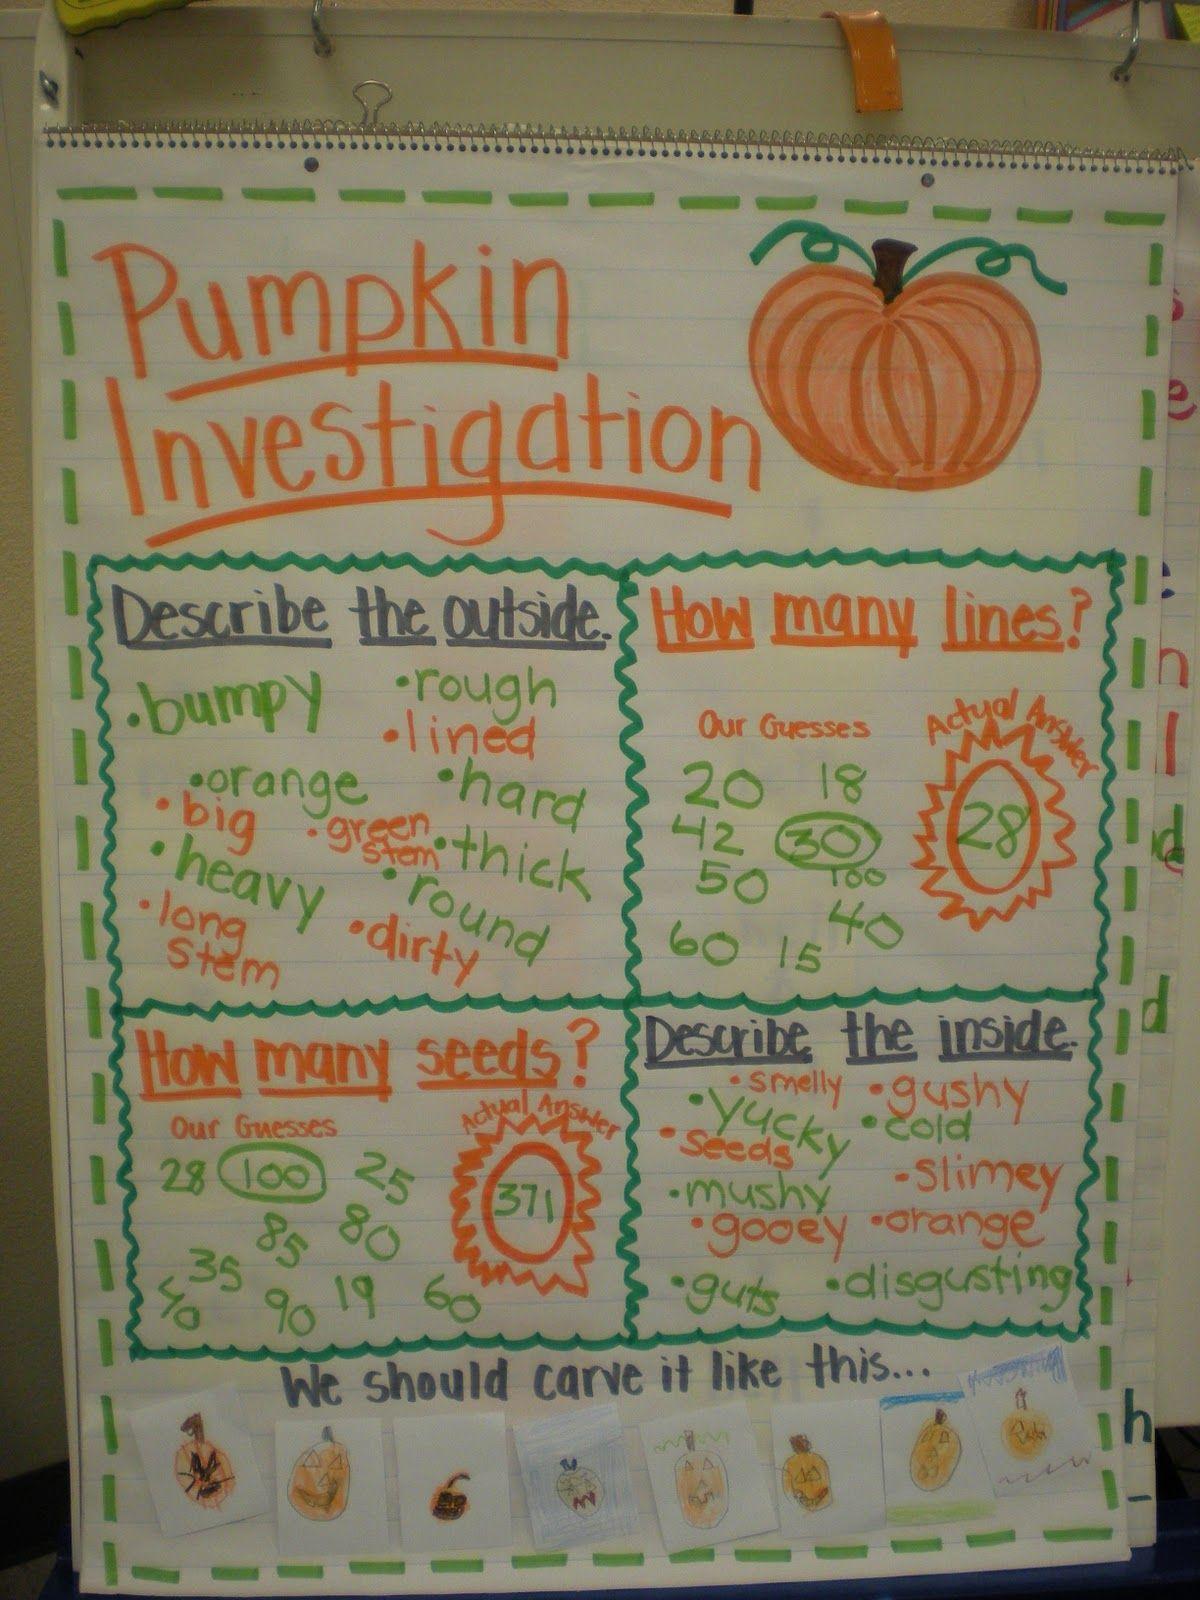 From The Good Life Pumpkins Pumpkins Everywhere A